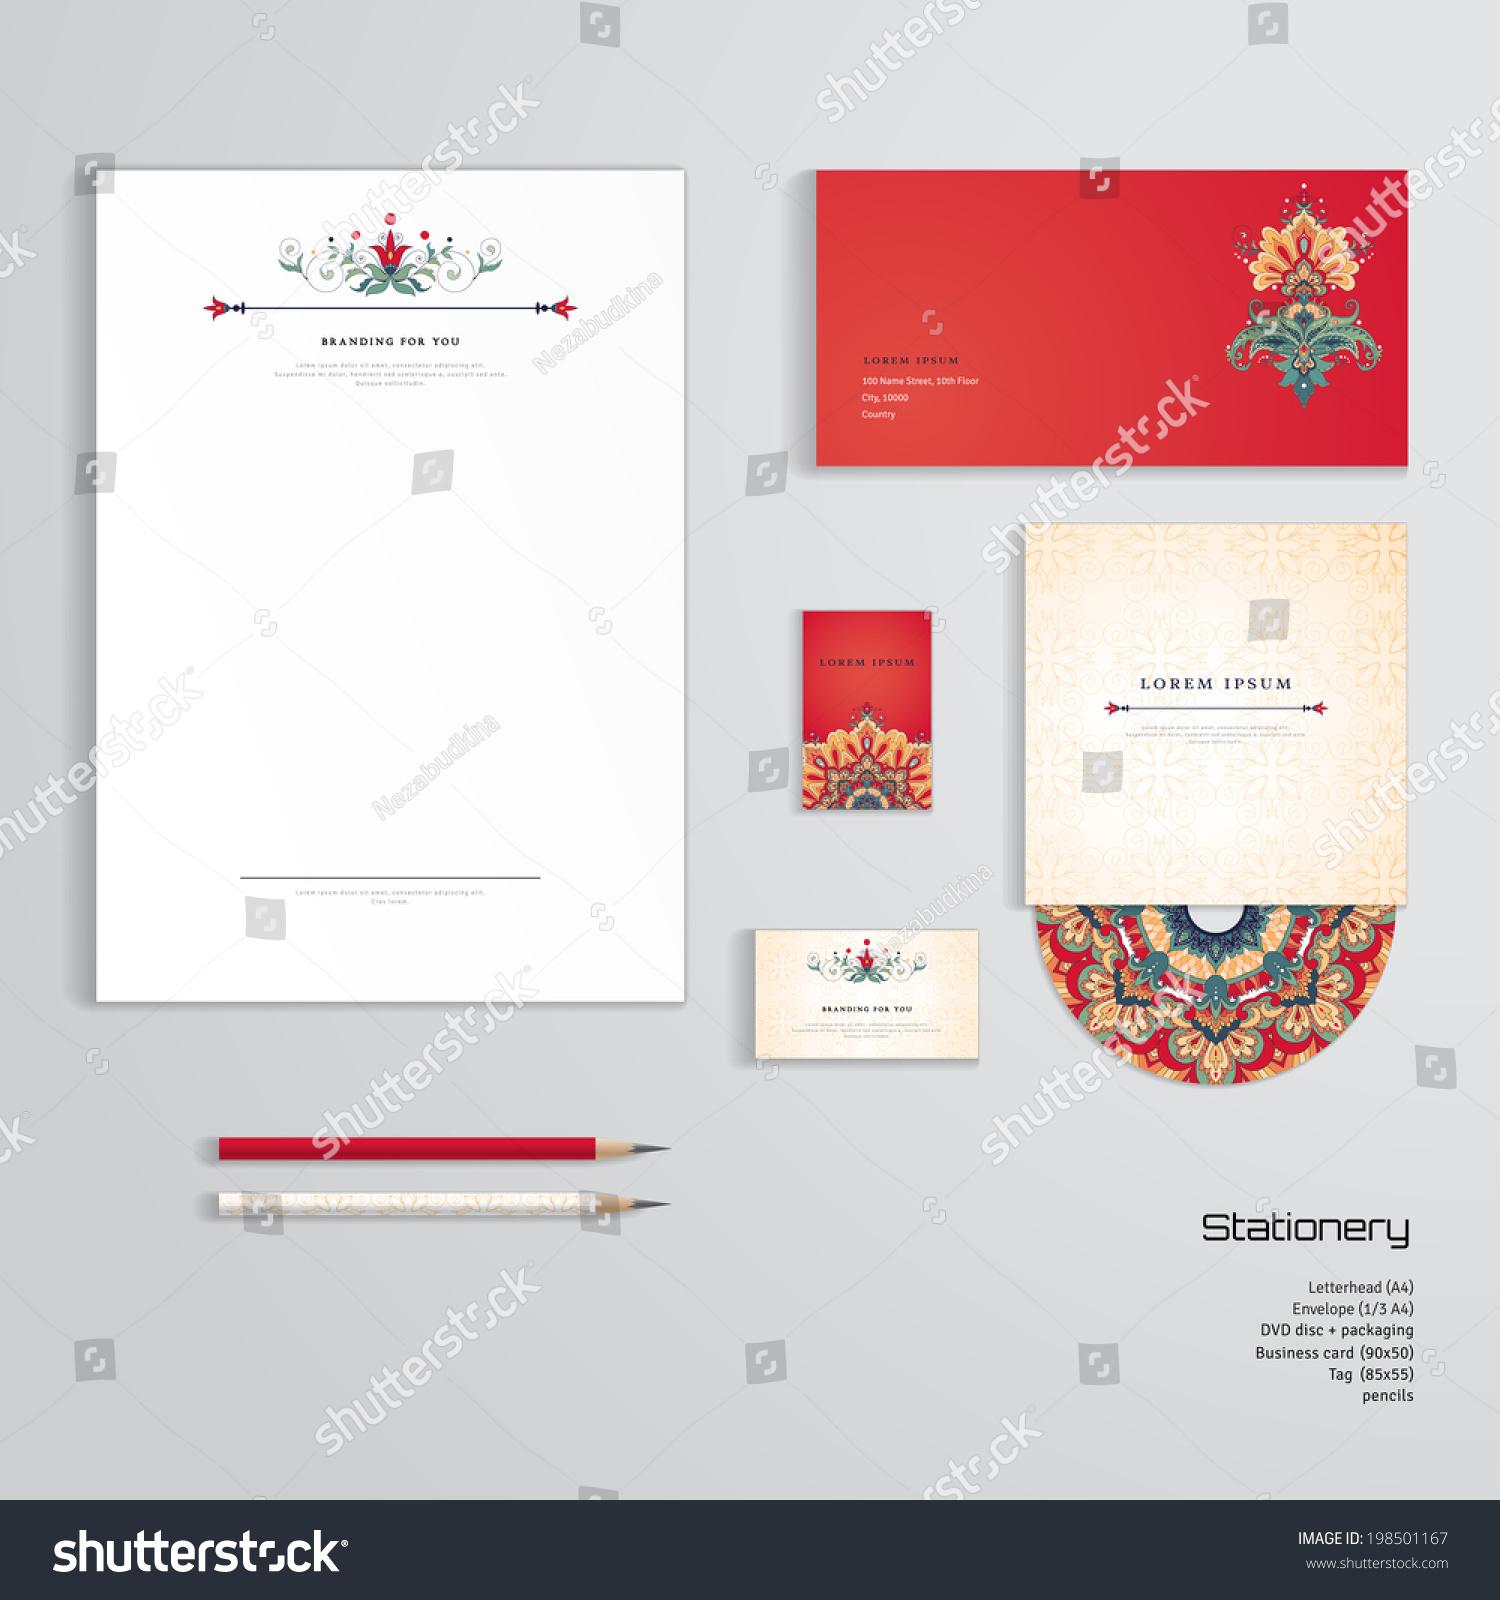 Vector identity templates letterhead envelope business stock vector vector identity templates letterhead envelope business card tag disc with packaging colourmoves